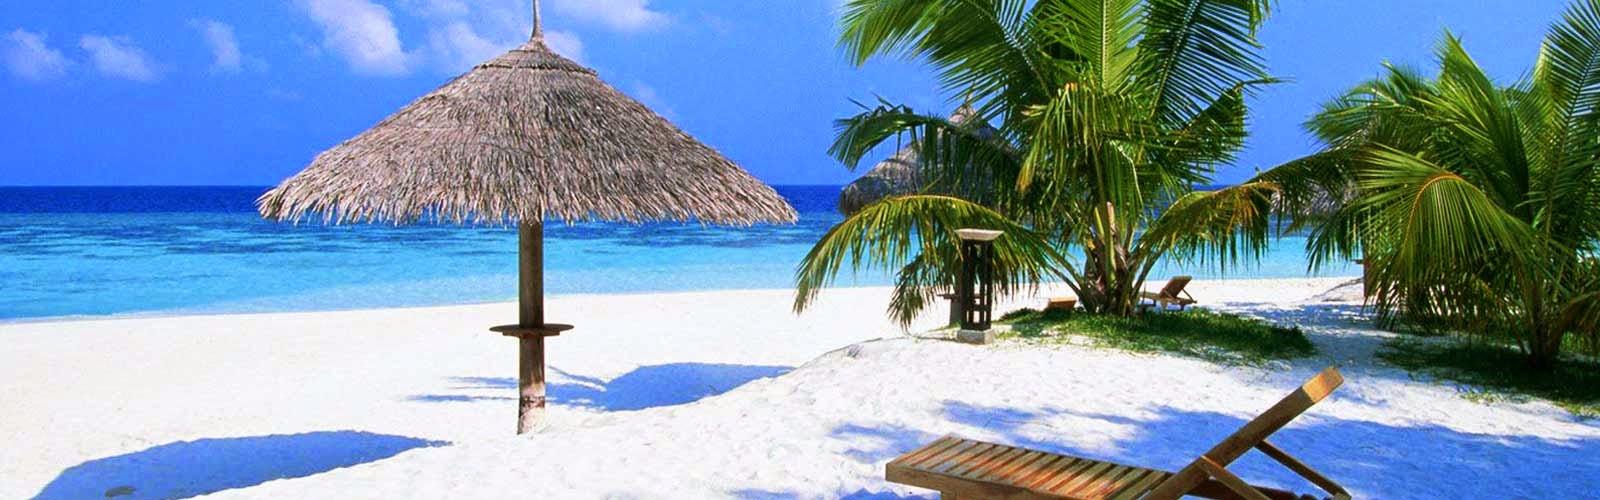 Best Beaches And Budget Hotels In Sri Lanka